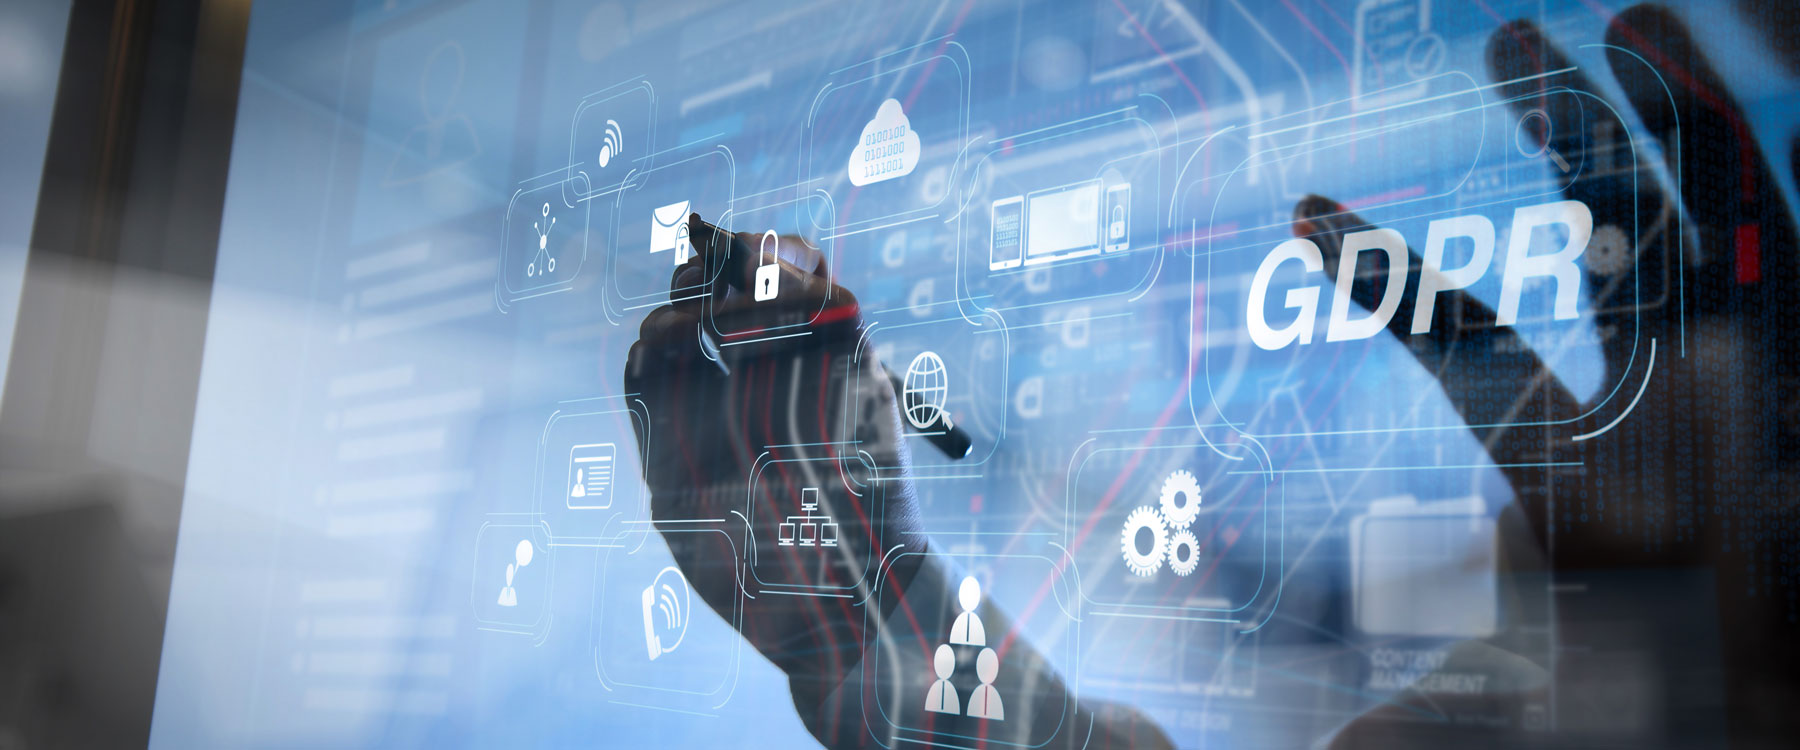 Athena Data Centres acquire GDPR Direct